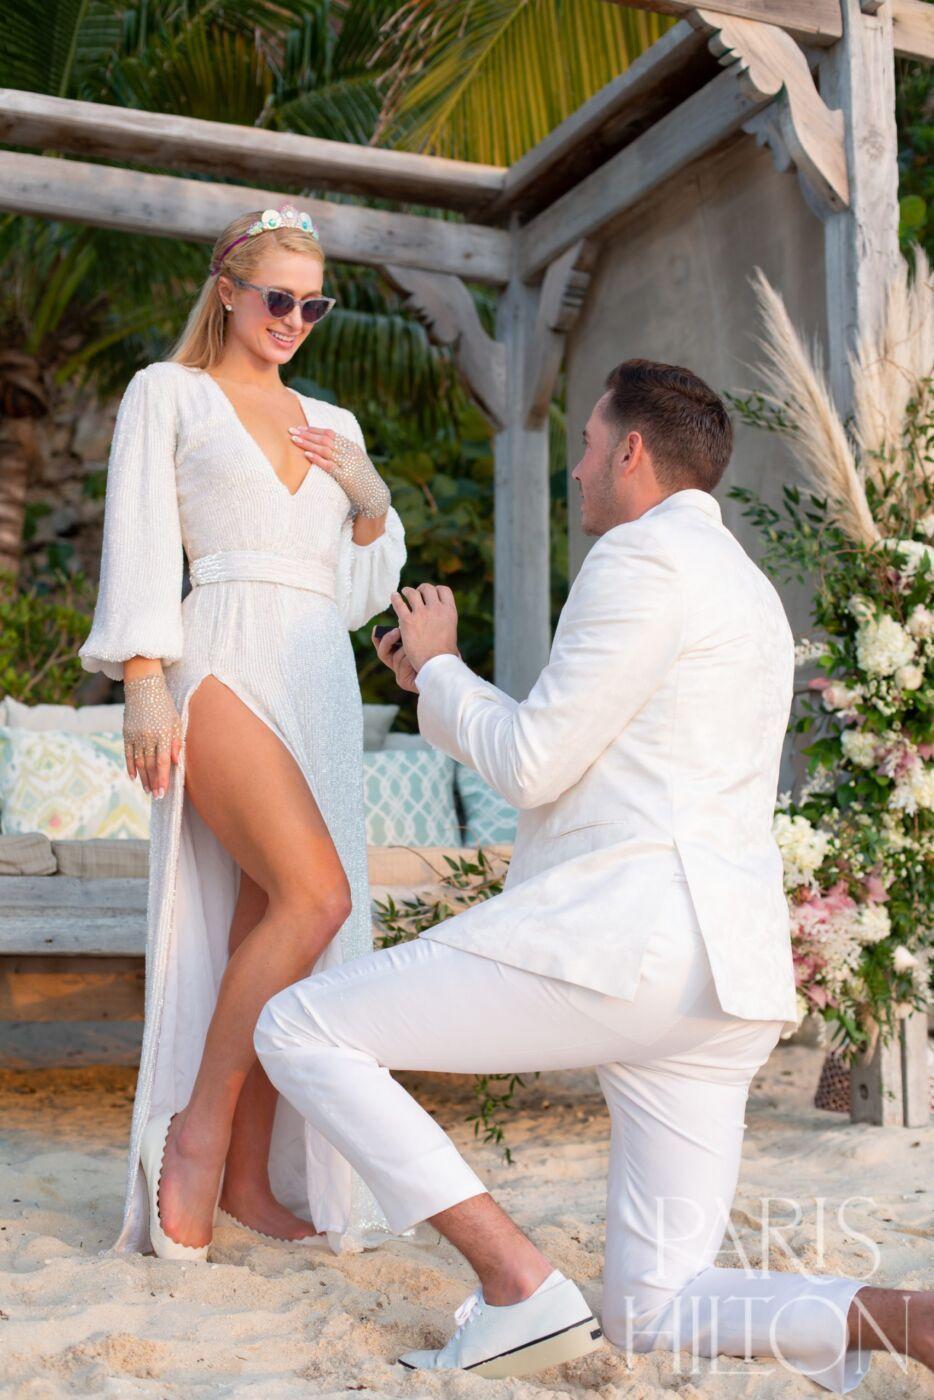 https://www.weddingmagazine.com.ua/wp-content/uploads/2021/02/paris-hilton-carter-engaged-5.jpg